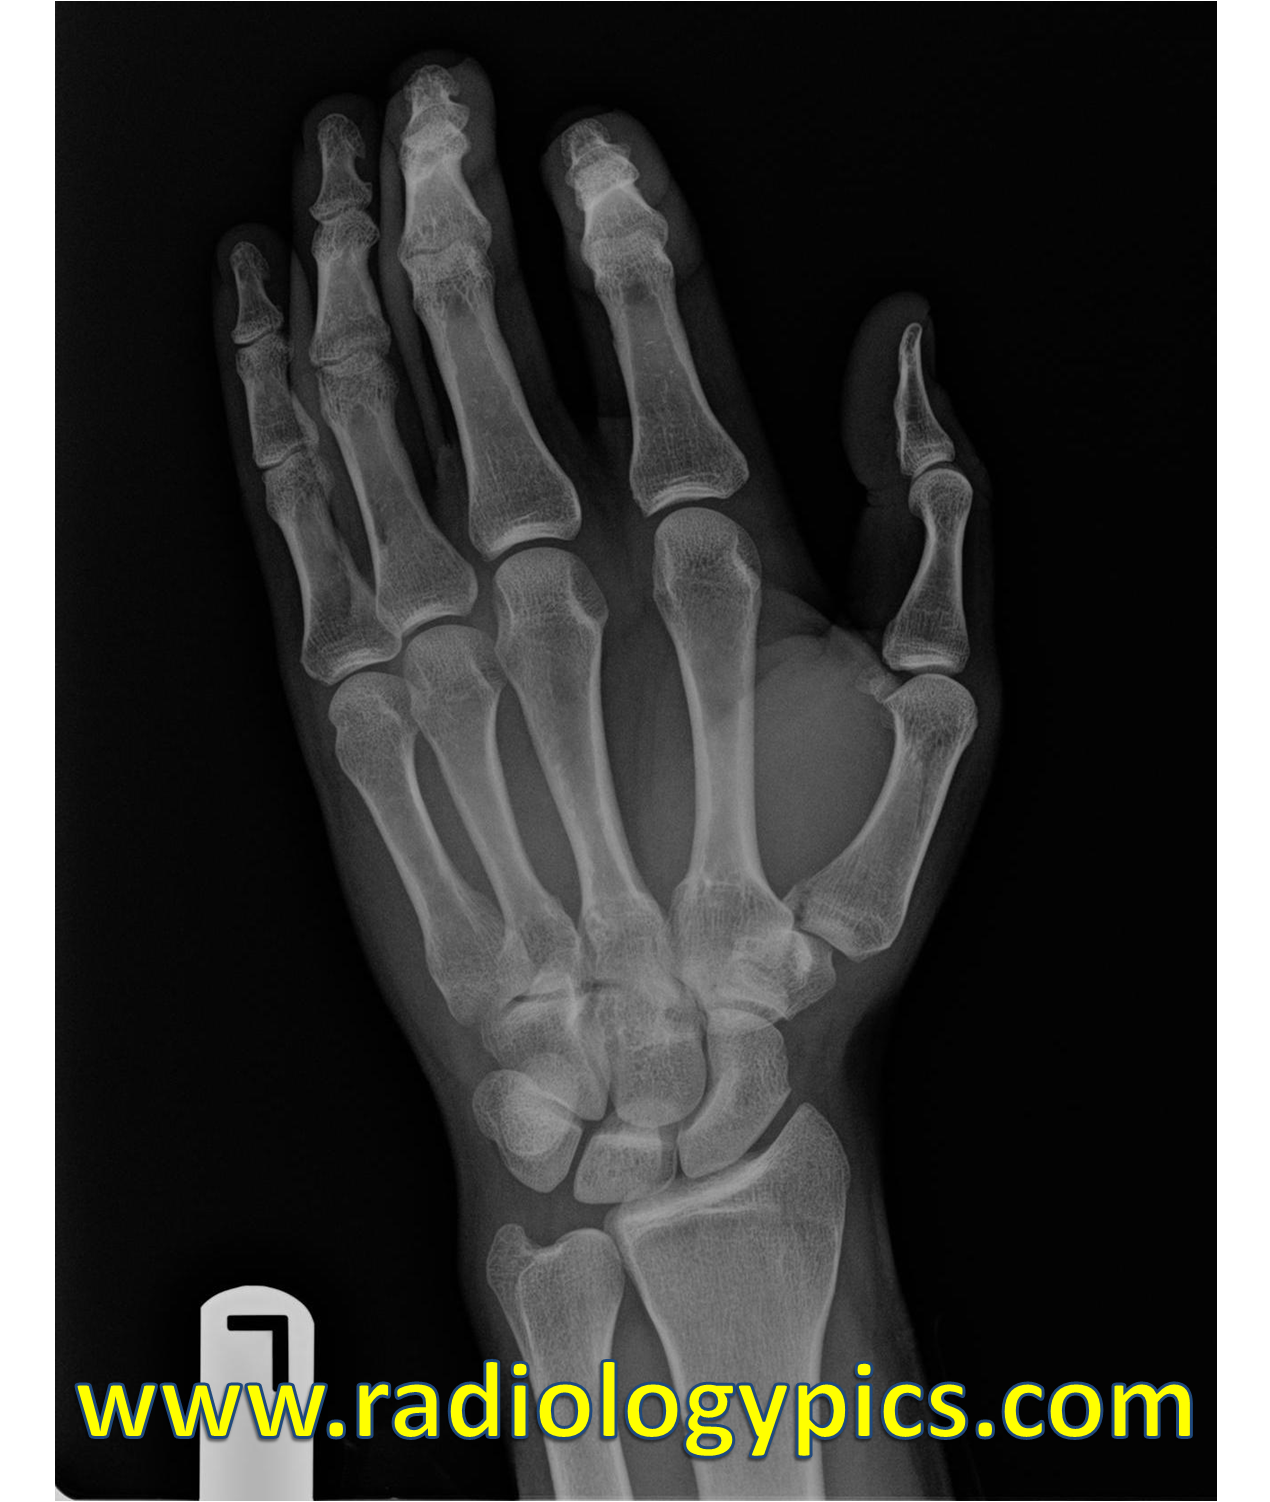 Unknown Case #25 – Hand Radiograph | RADIOLOGYPICS.COM